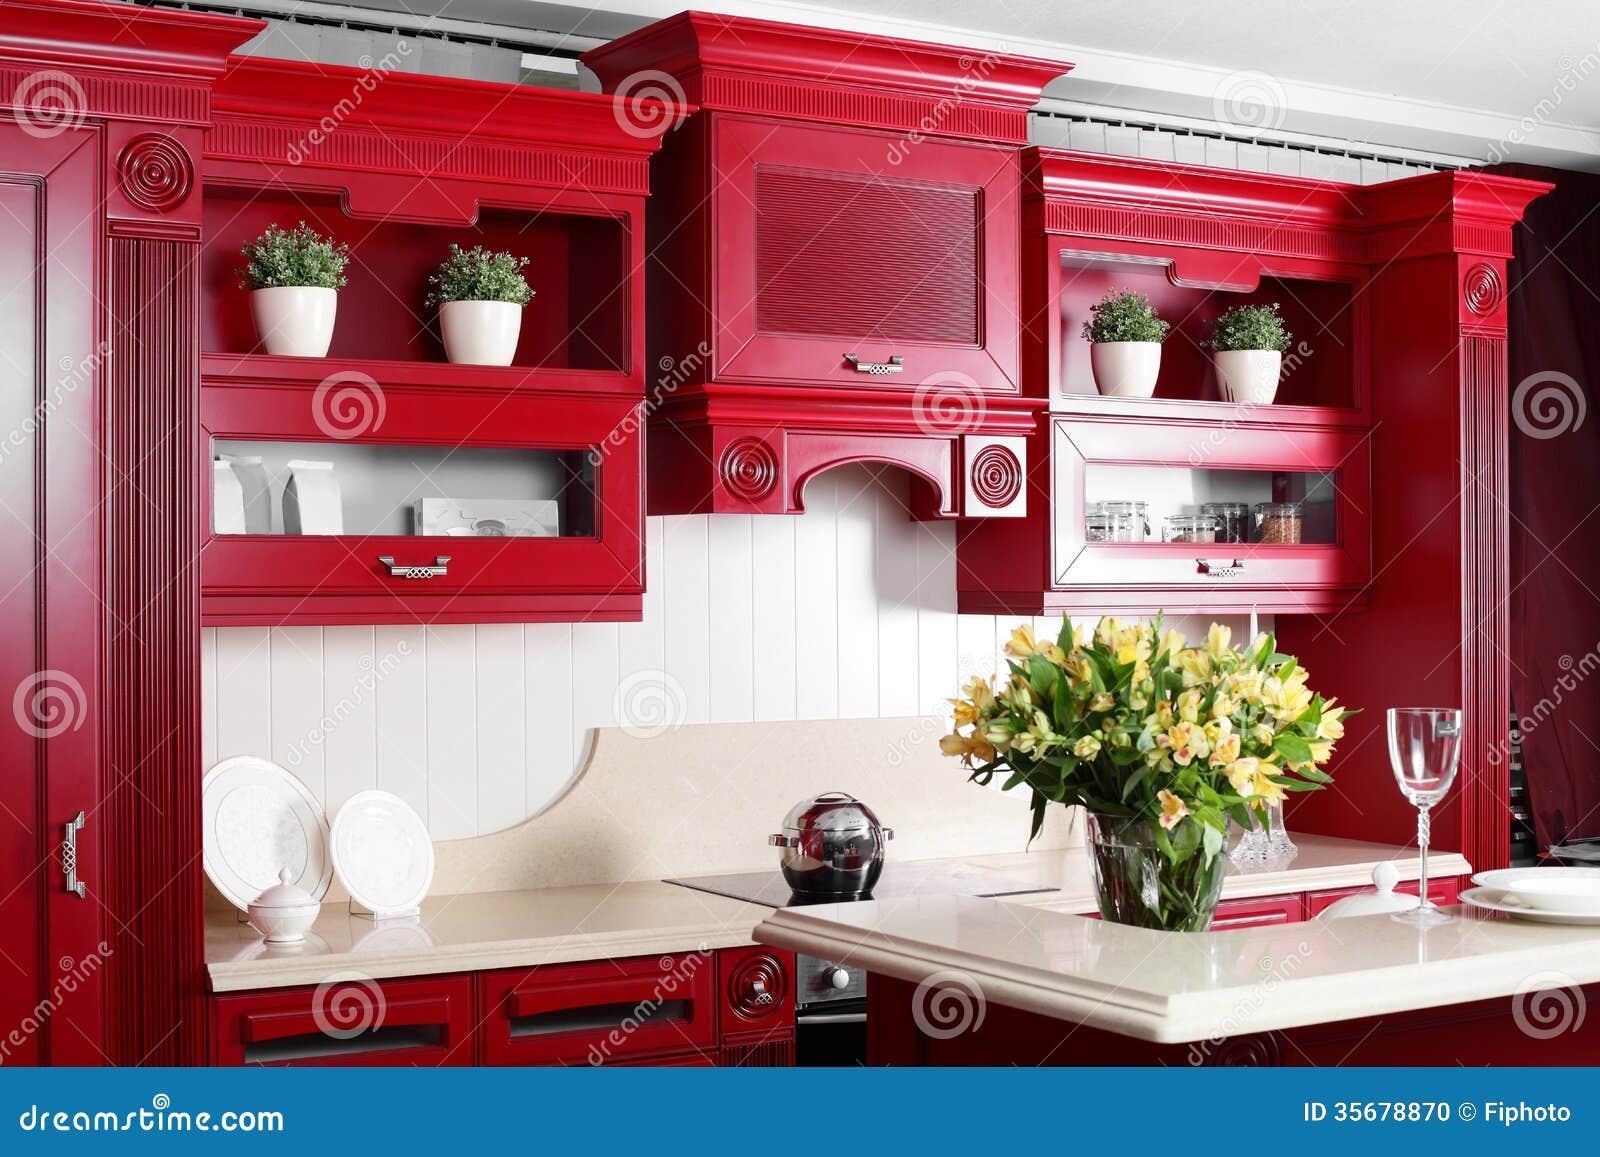 Modern Red Kitchen With Stylish Furniture Stock Photo  Image